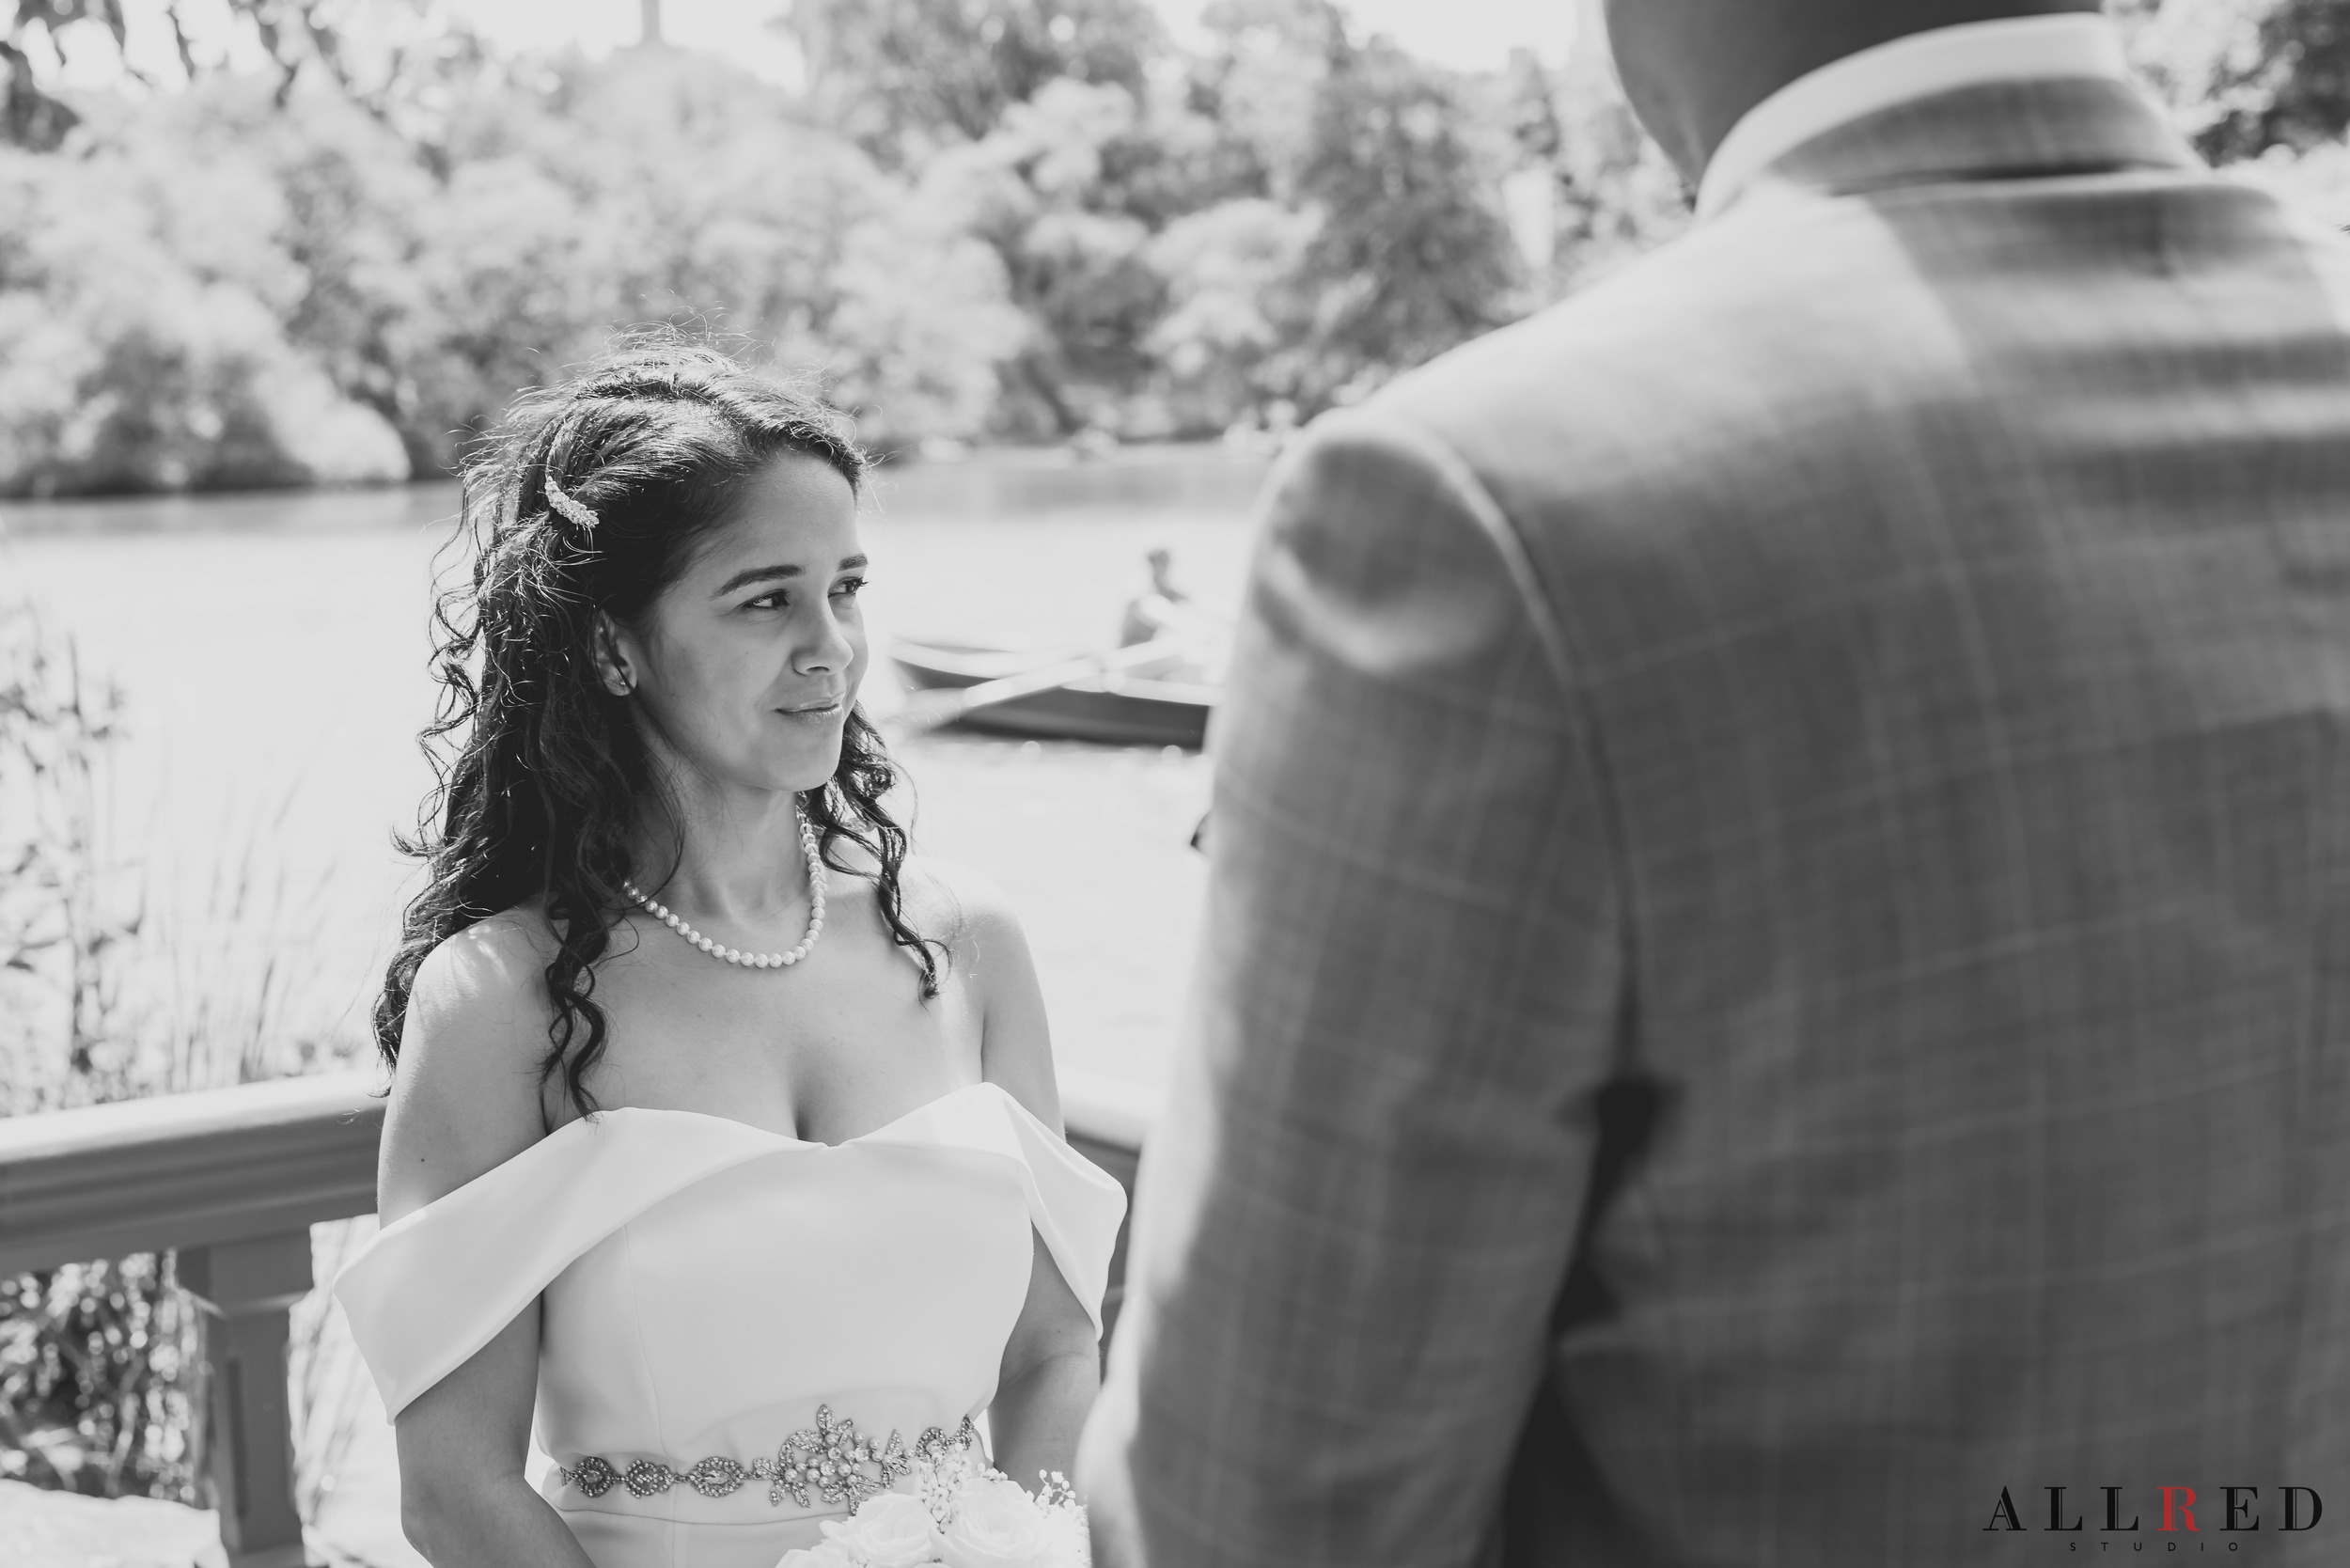 Wedding-central-park-allred-studio-new-york-photographer-new-jersey-hudson-valley-2125.jpg